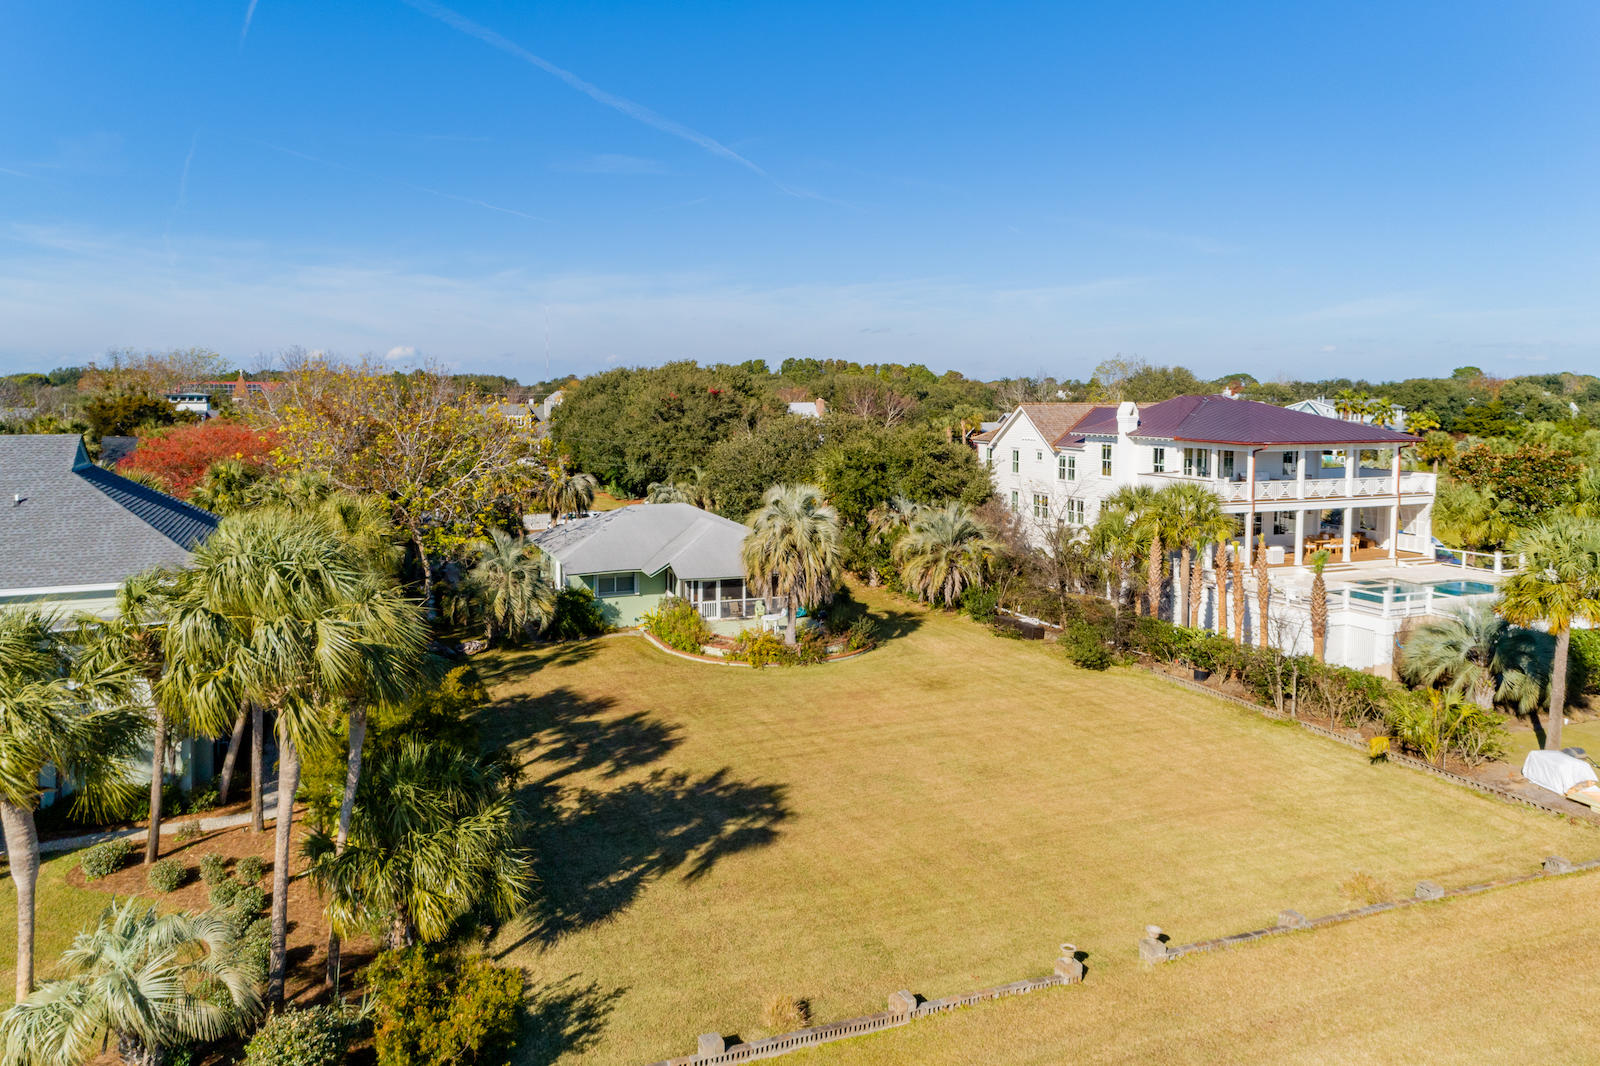 Sullivans Island Homes For Sale - 2525 Atlantic, Sullivans Island, SC - 4